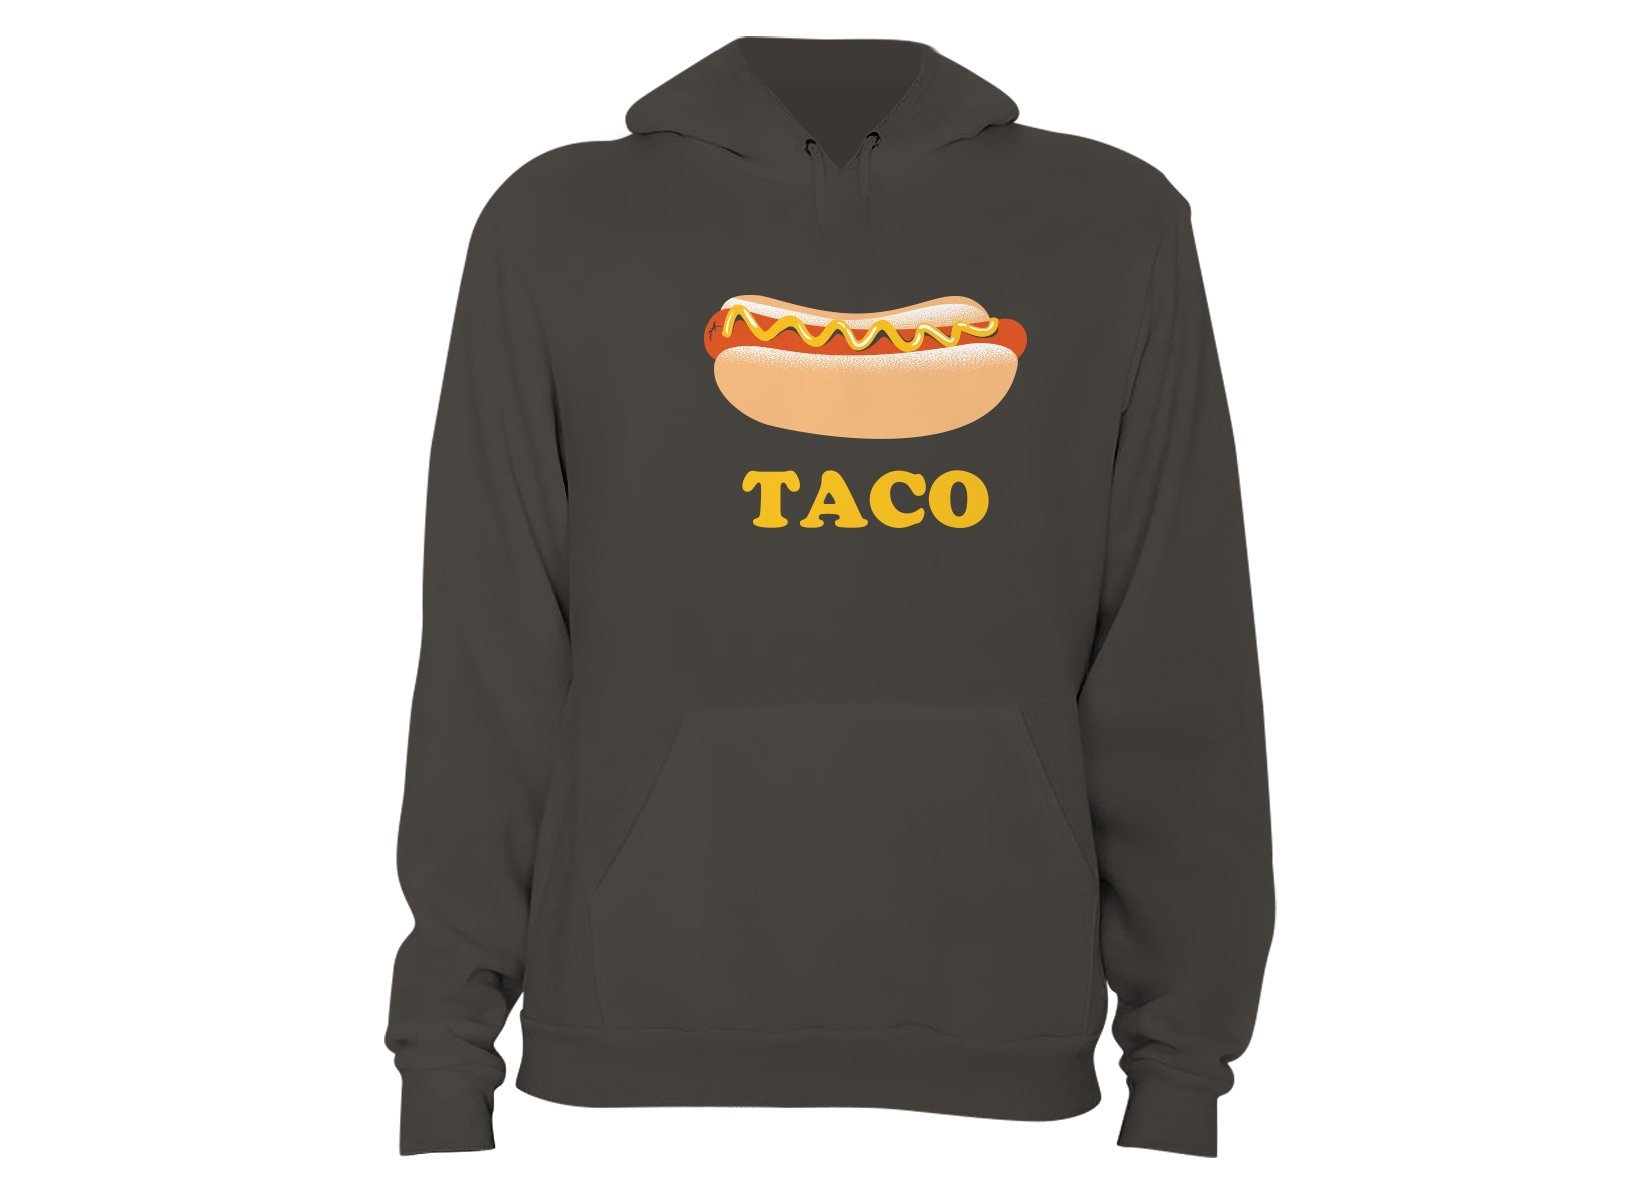 Hotdog Taco on Hoodie